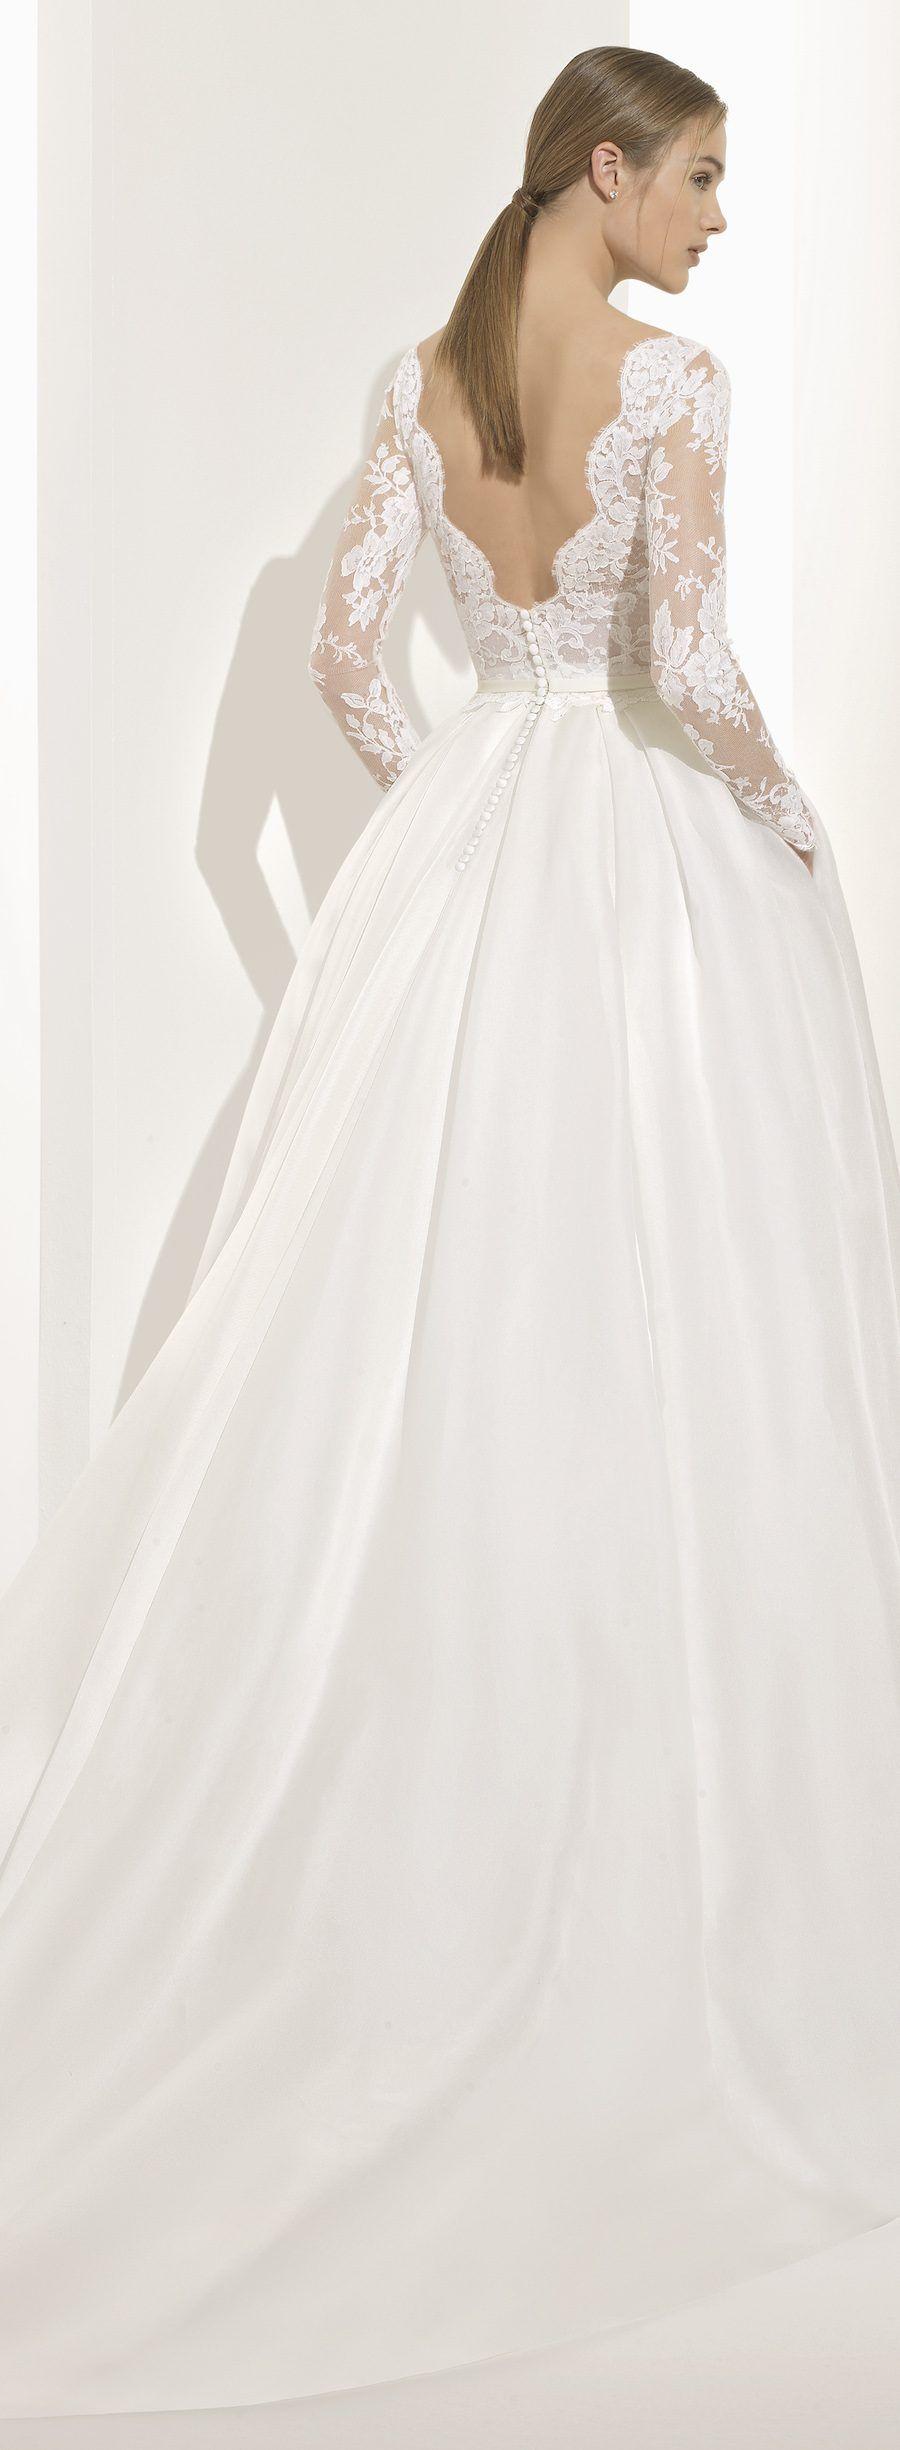 Wedding-Dresses-0858